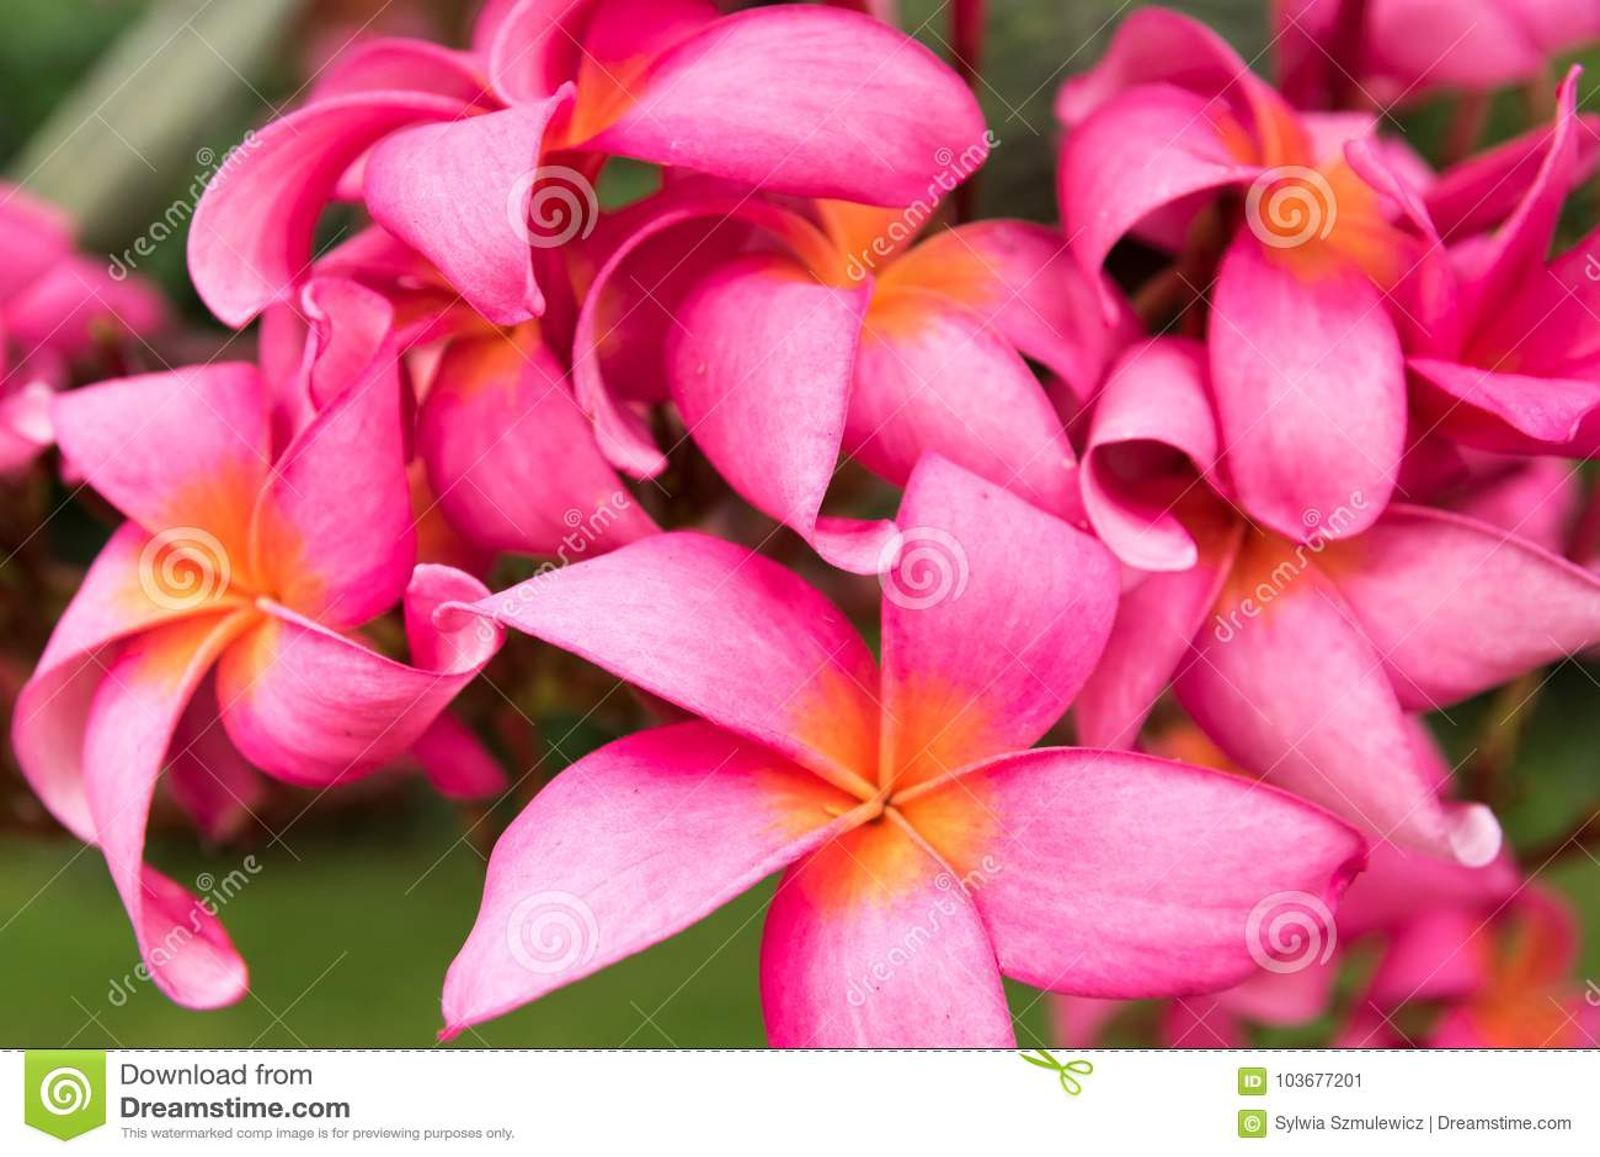 Pink Wild Tropical Asian Frangipani Flower Stock Image